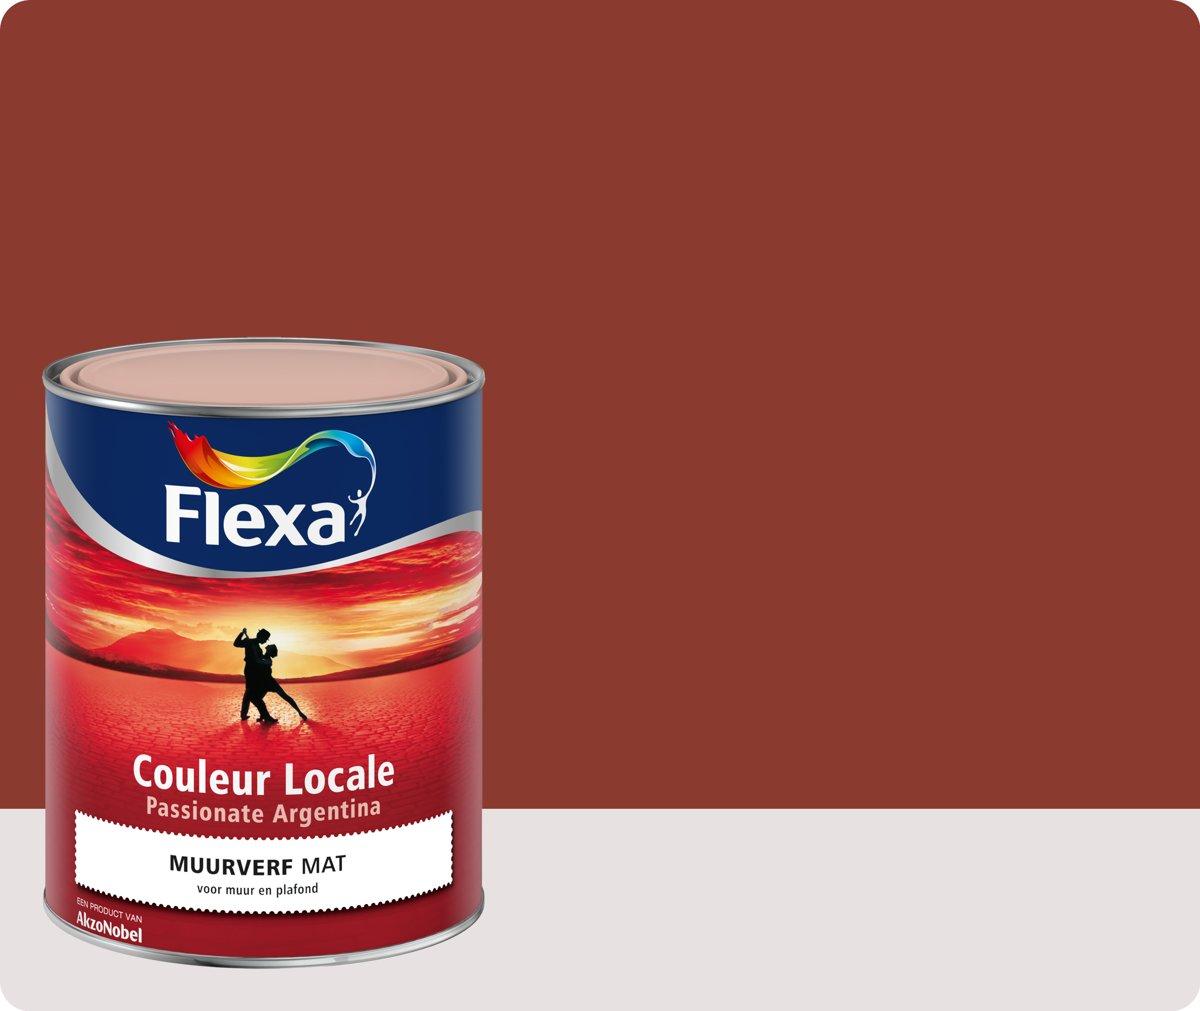 Flexa Couleur Locale - Muurverf Mat - Passionate Argentina Kiss  - 9045 - 1 liter